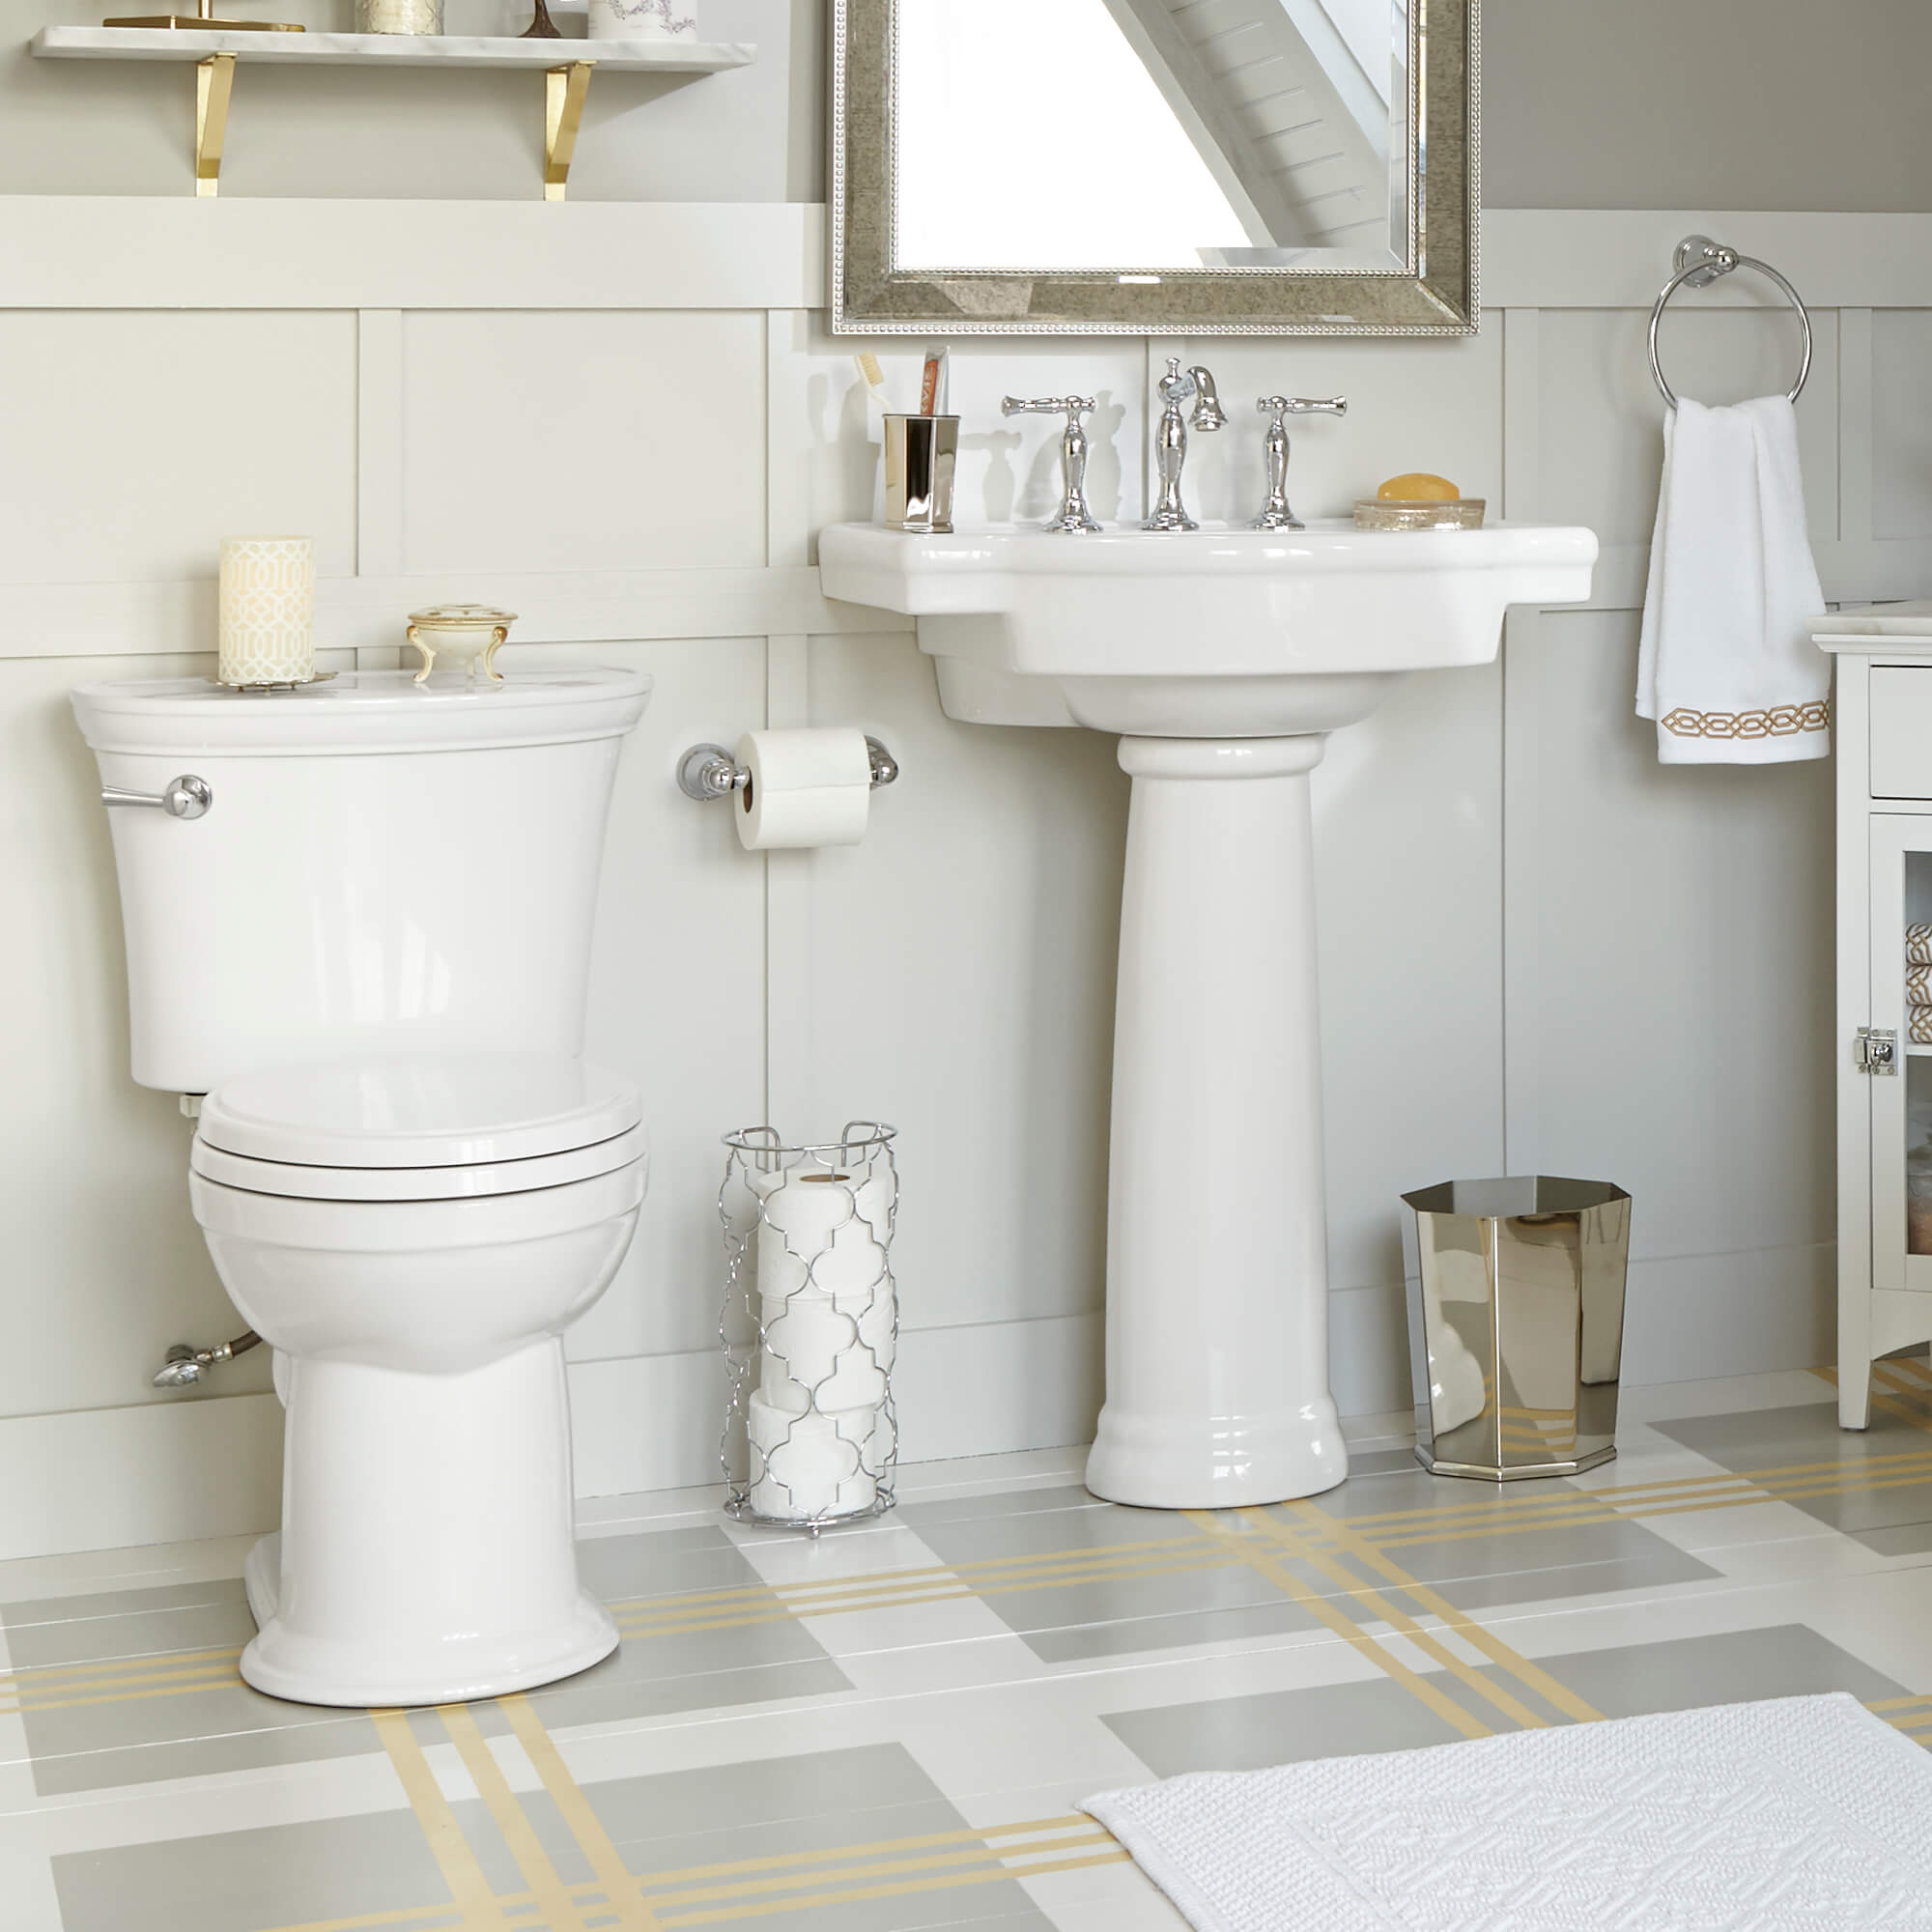 retrospect champion pro toilet